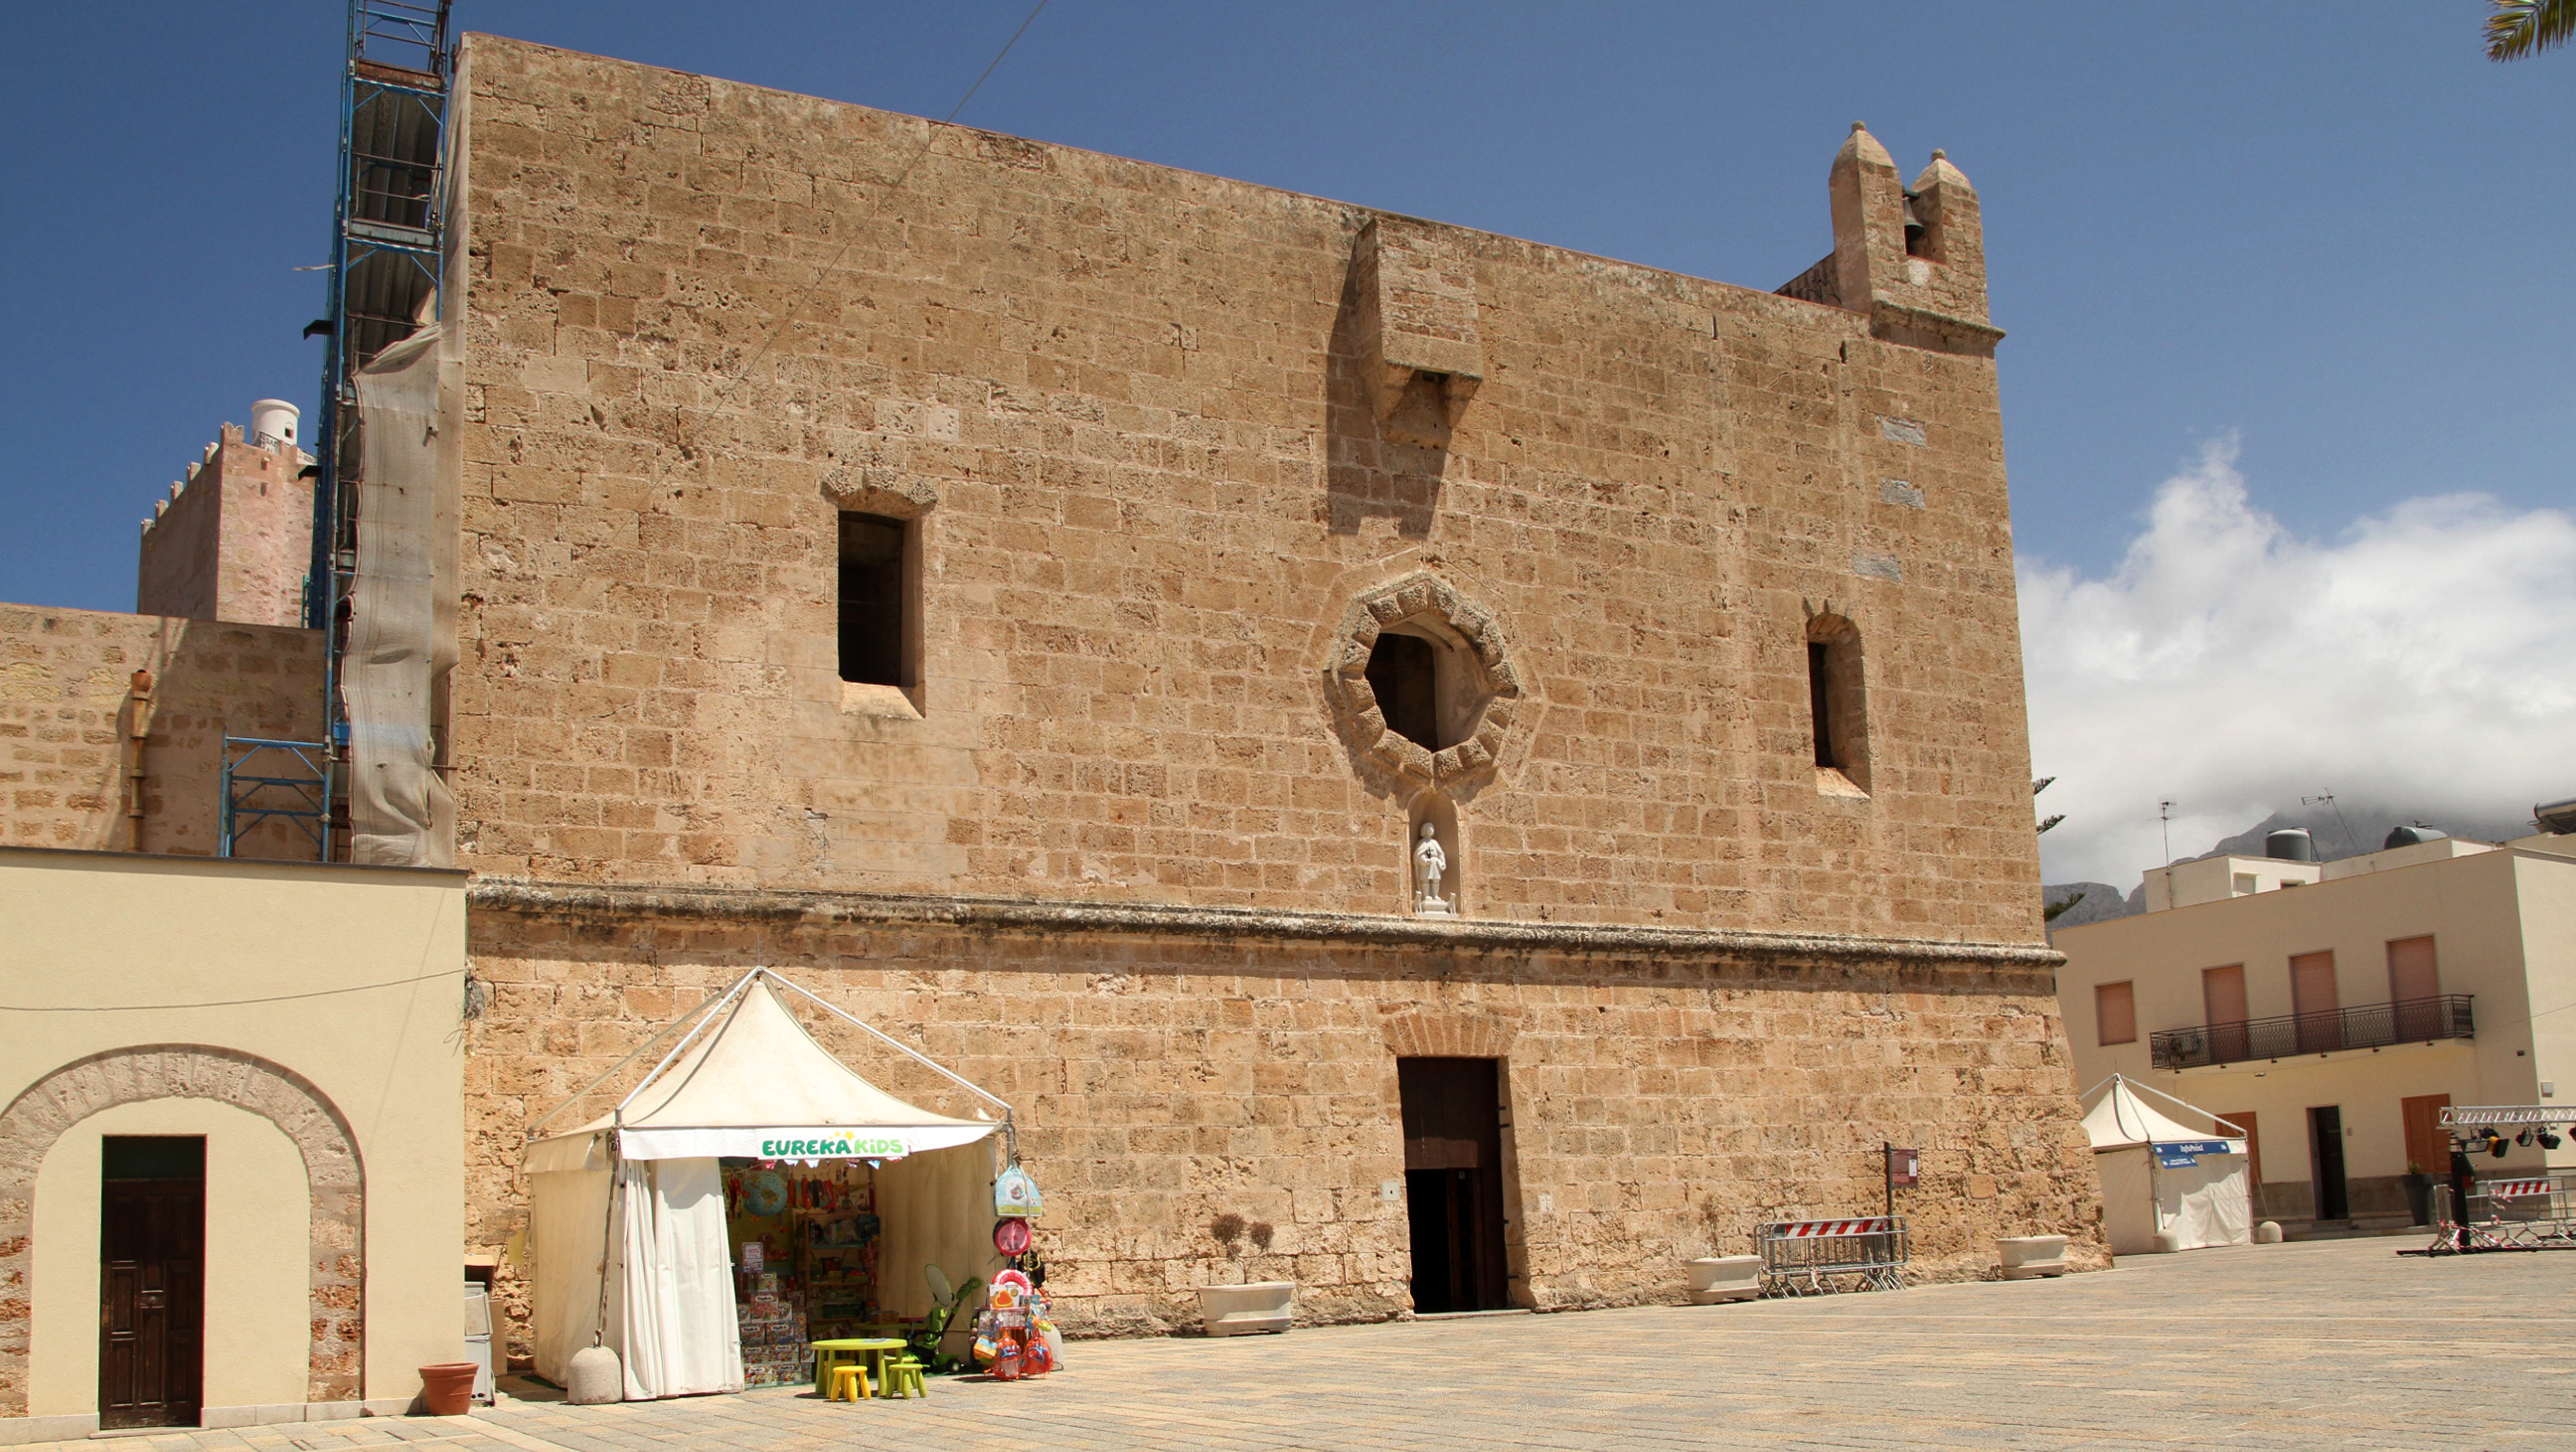 Chiesa Santuario, San Vito Lo Capo TP, Sicily, Italy - panoramio (1).jpg